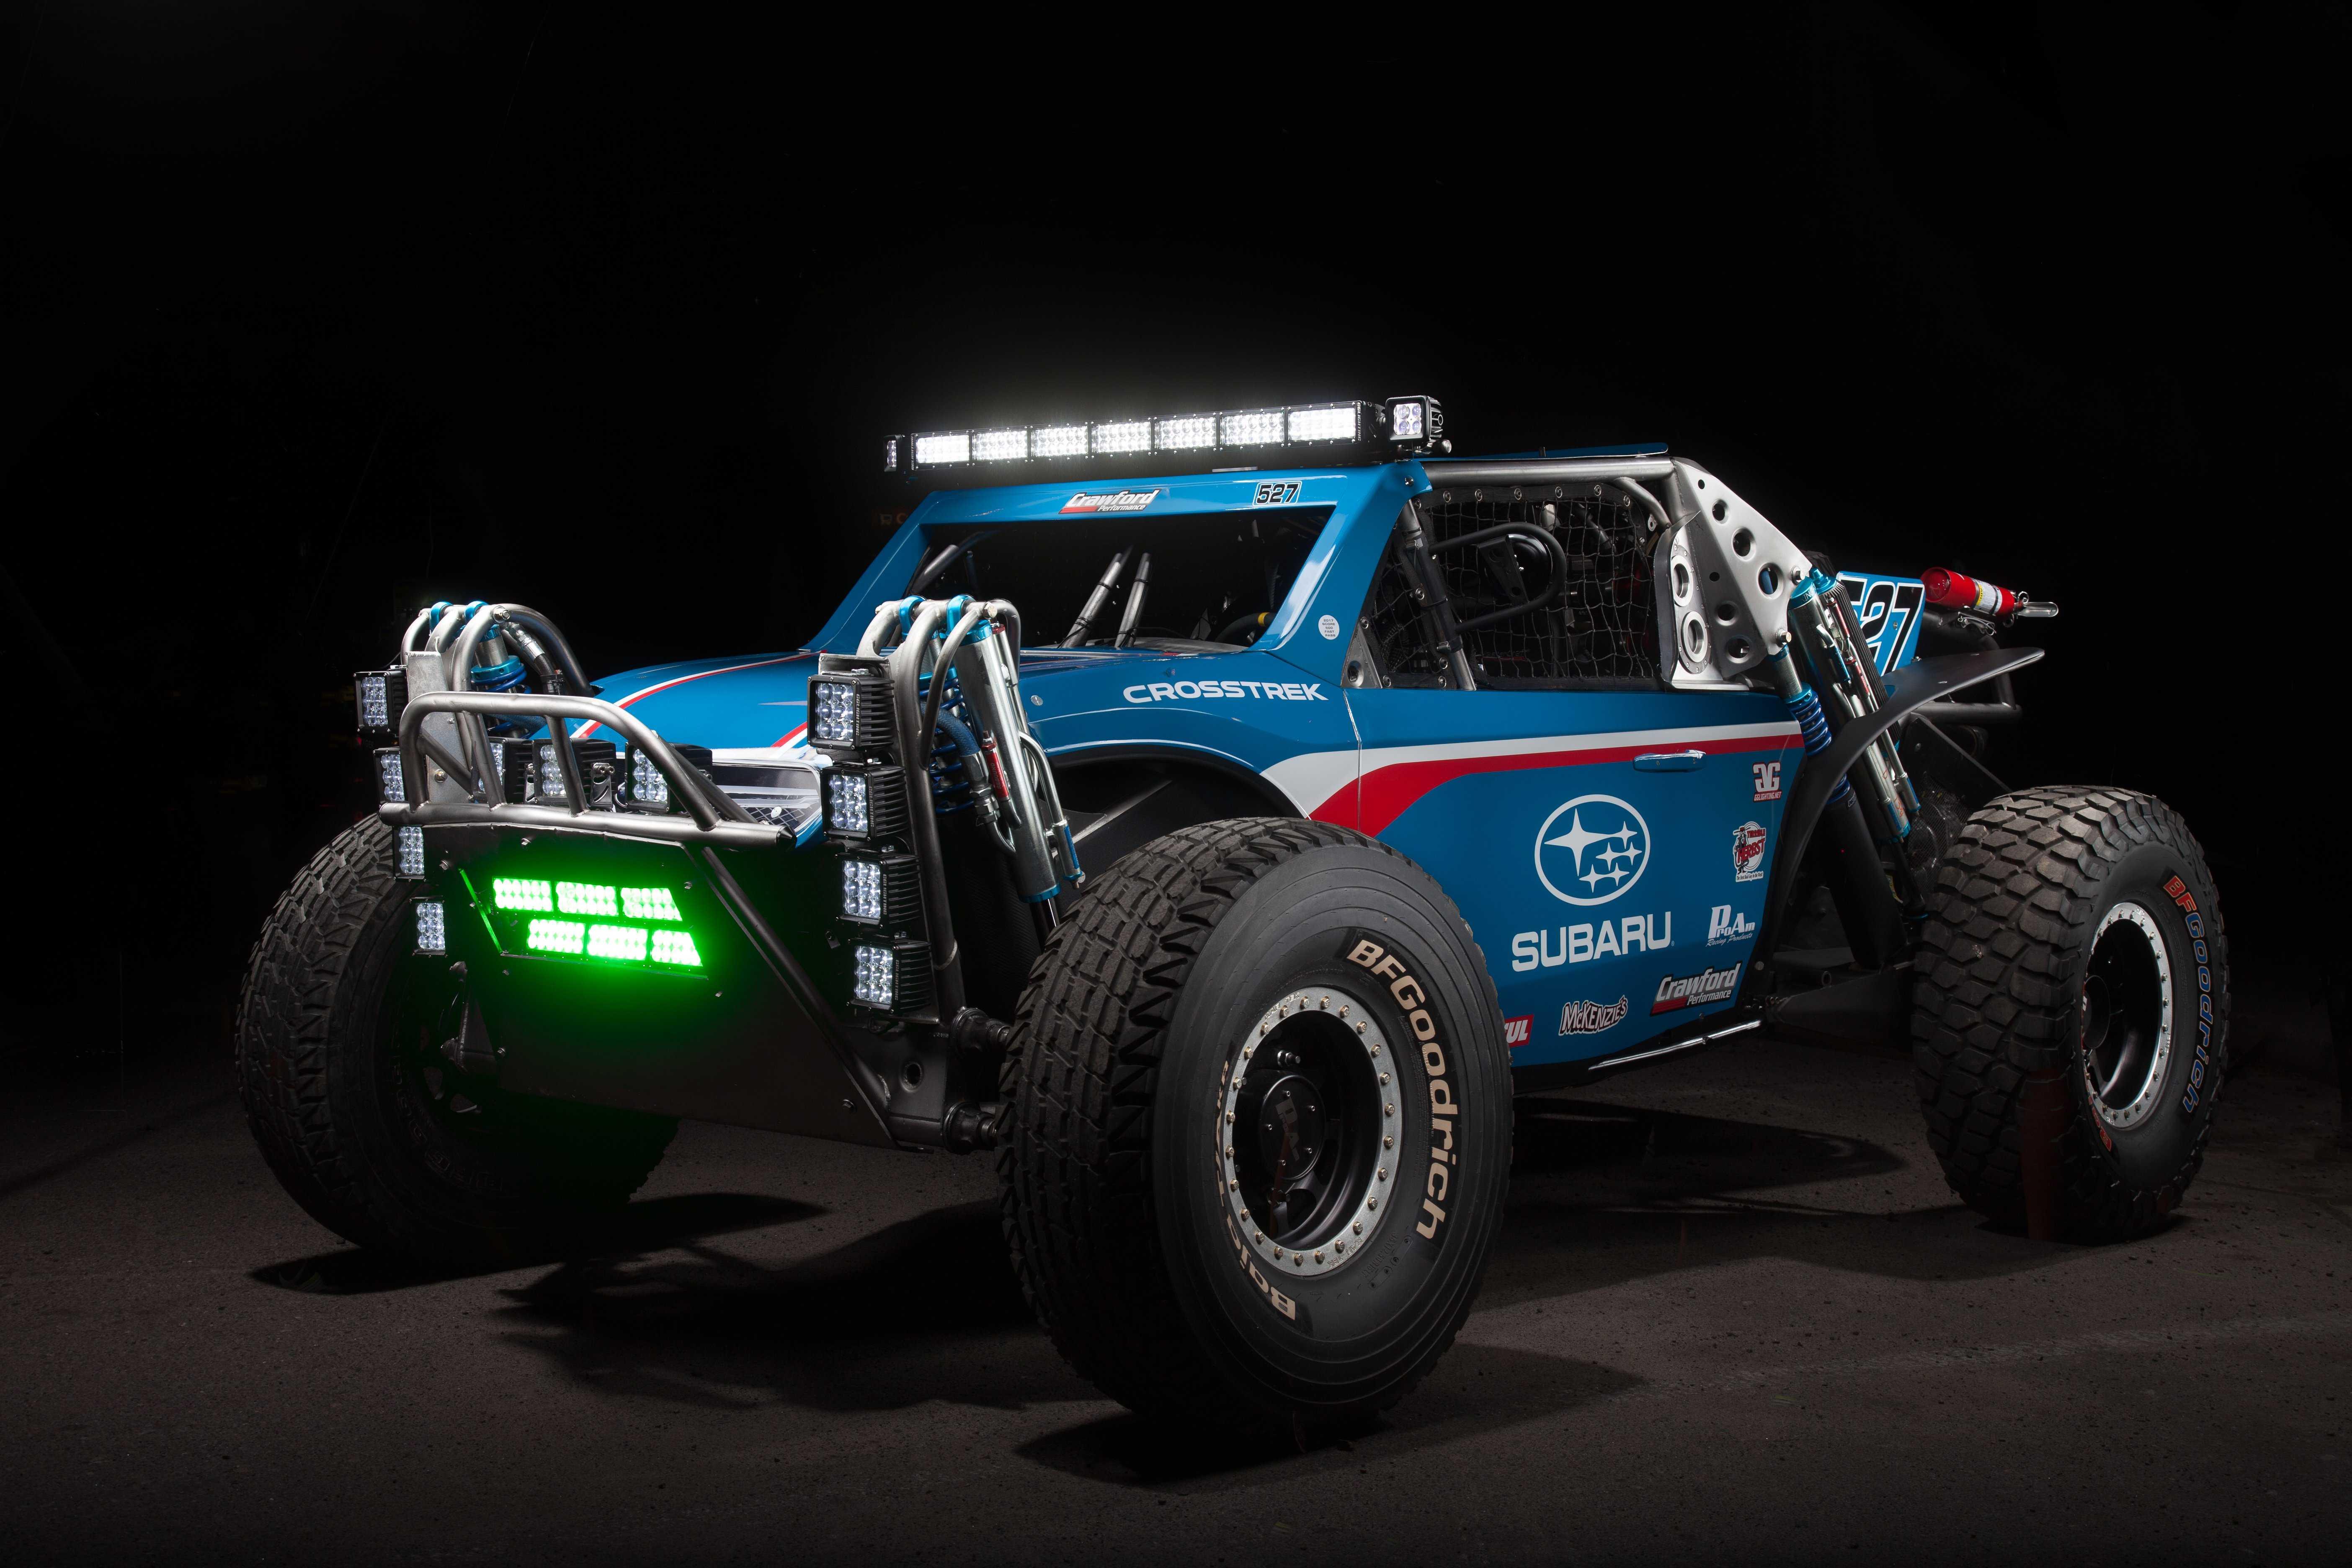 Grabowski Brothers Racing's Unlimited Class 5 Crosstrek Isn't Your Grandma's Subaru